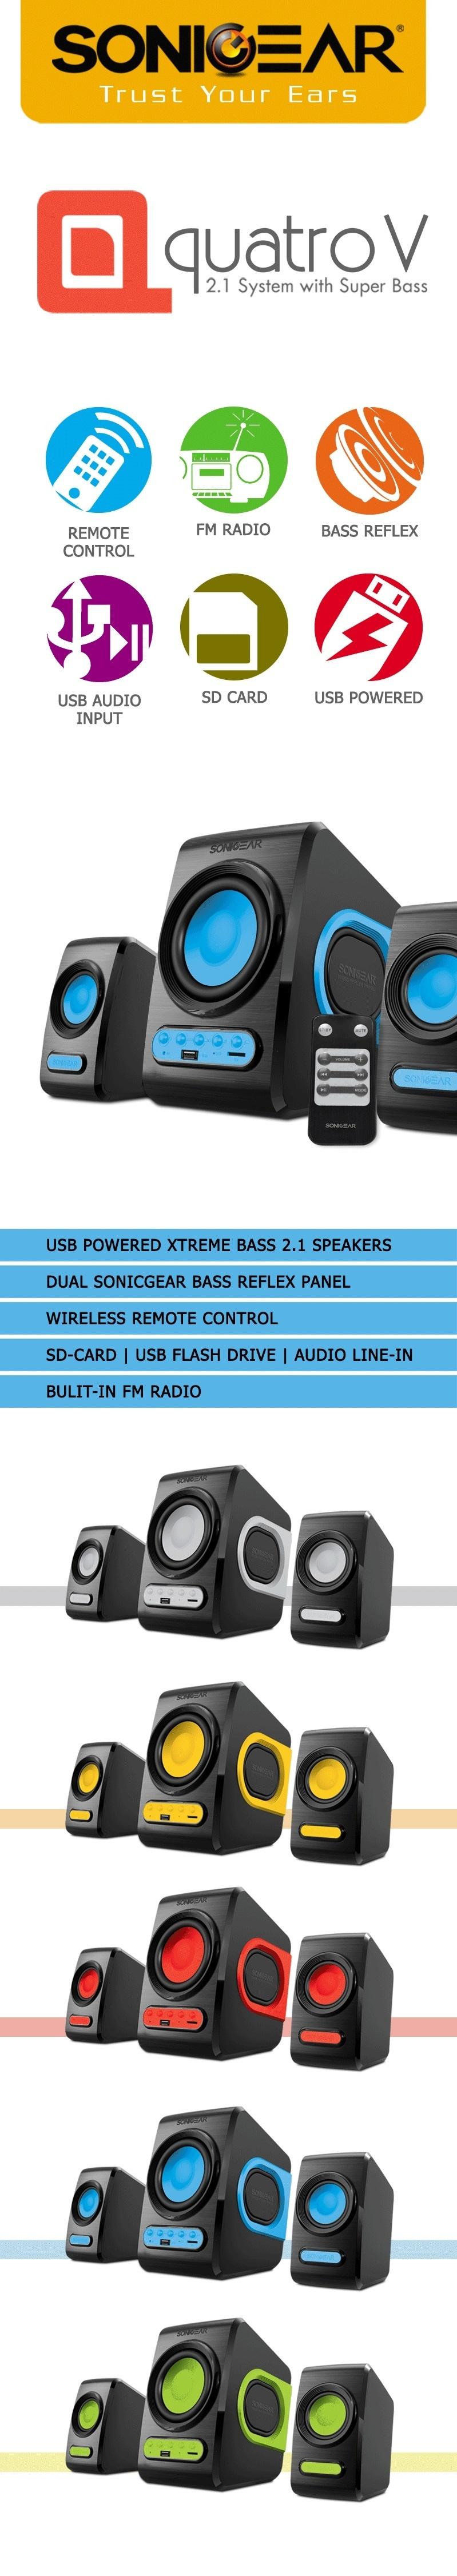 Sonic Gear Quatro V Speakers Singapore Evo 9 Btmi Bluetooth Memory Card Usb Radio Fm Specifications Of